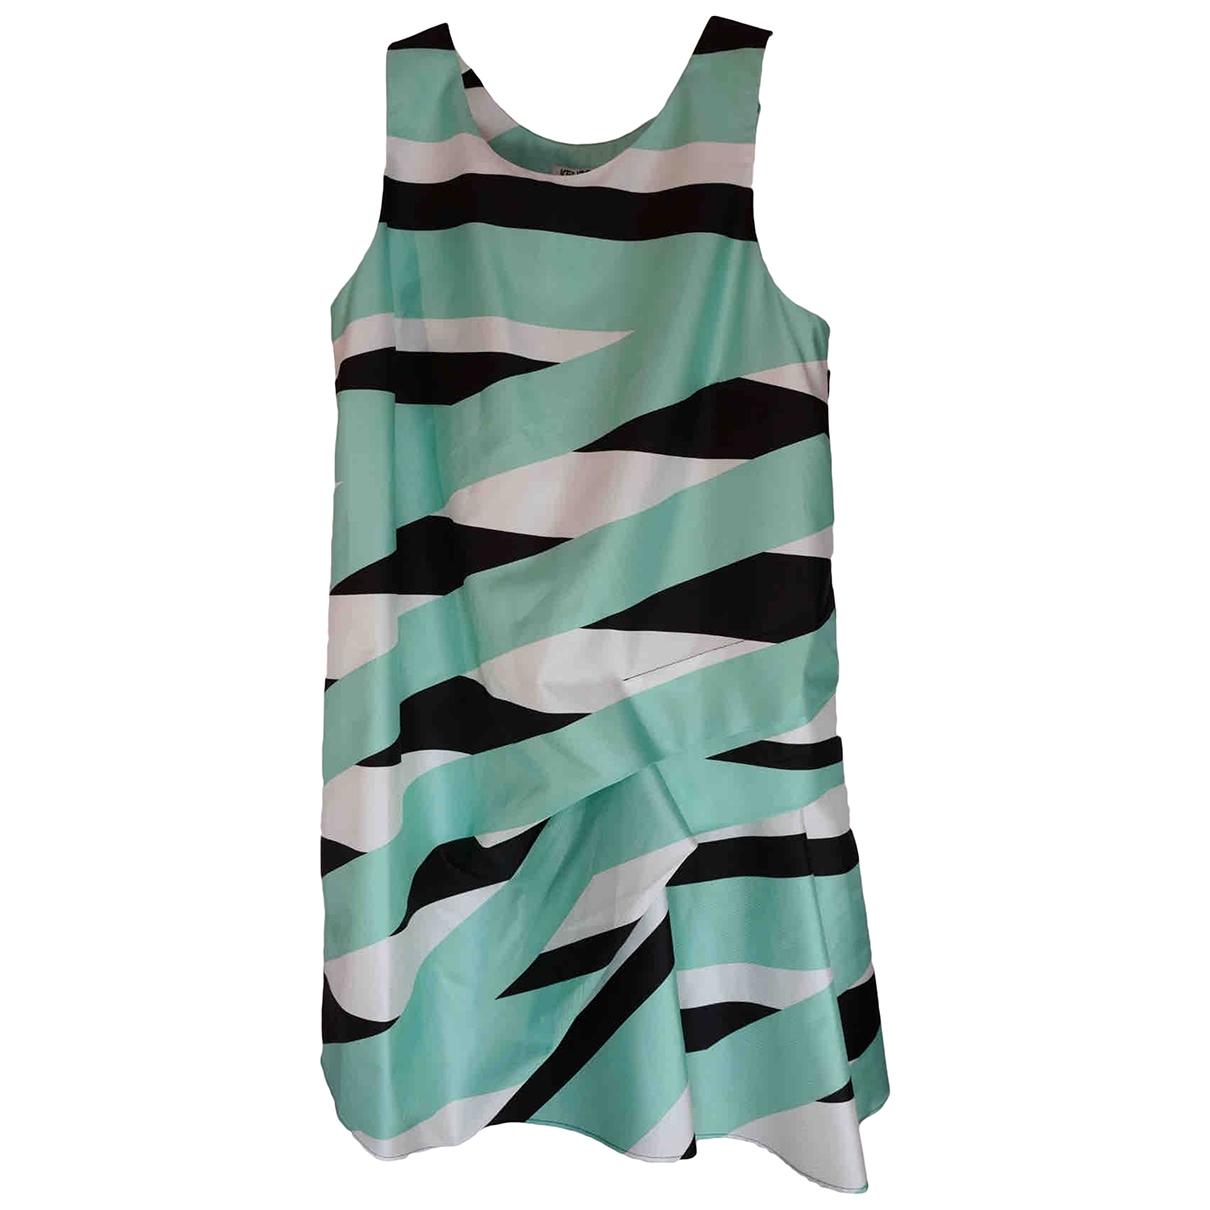 Kenzo \N Kleid in  Gruen Polyester